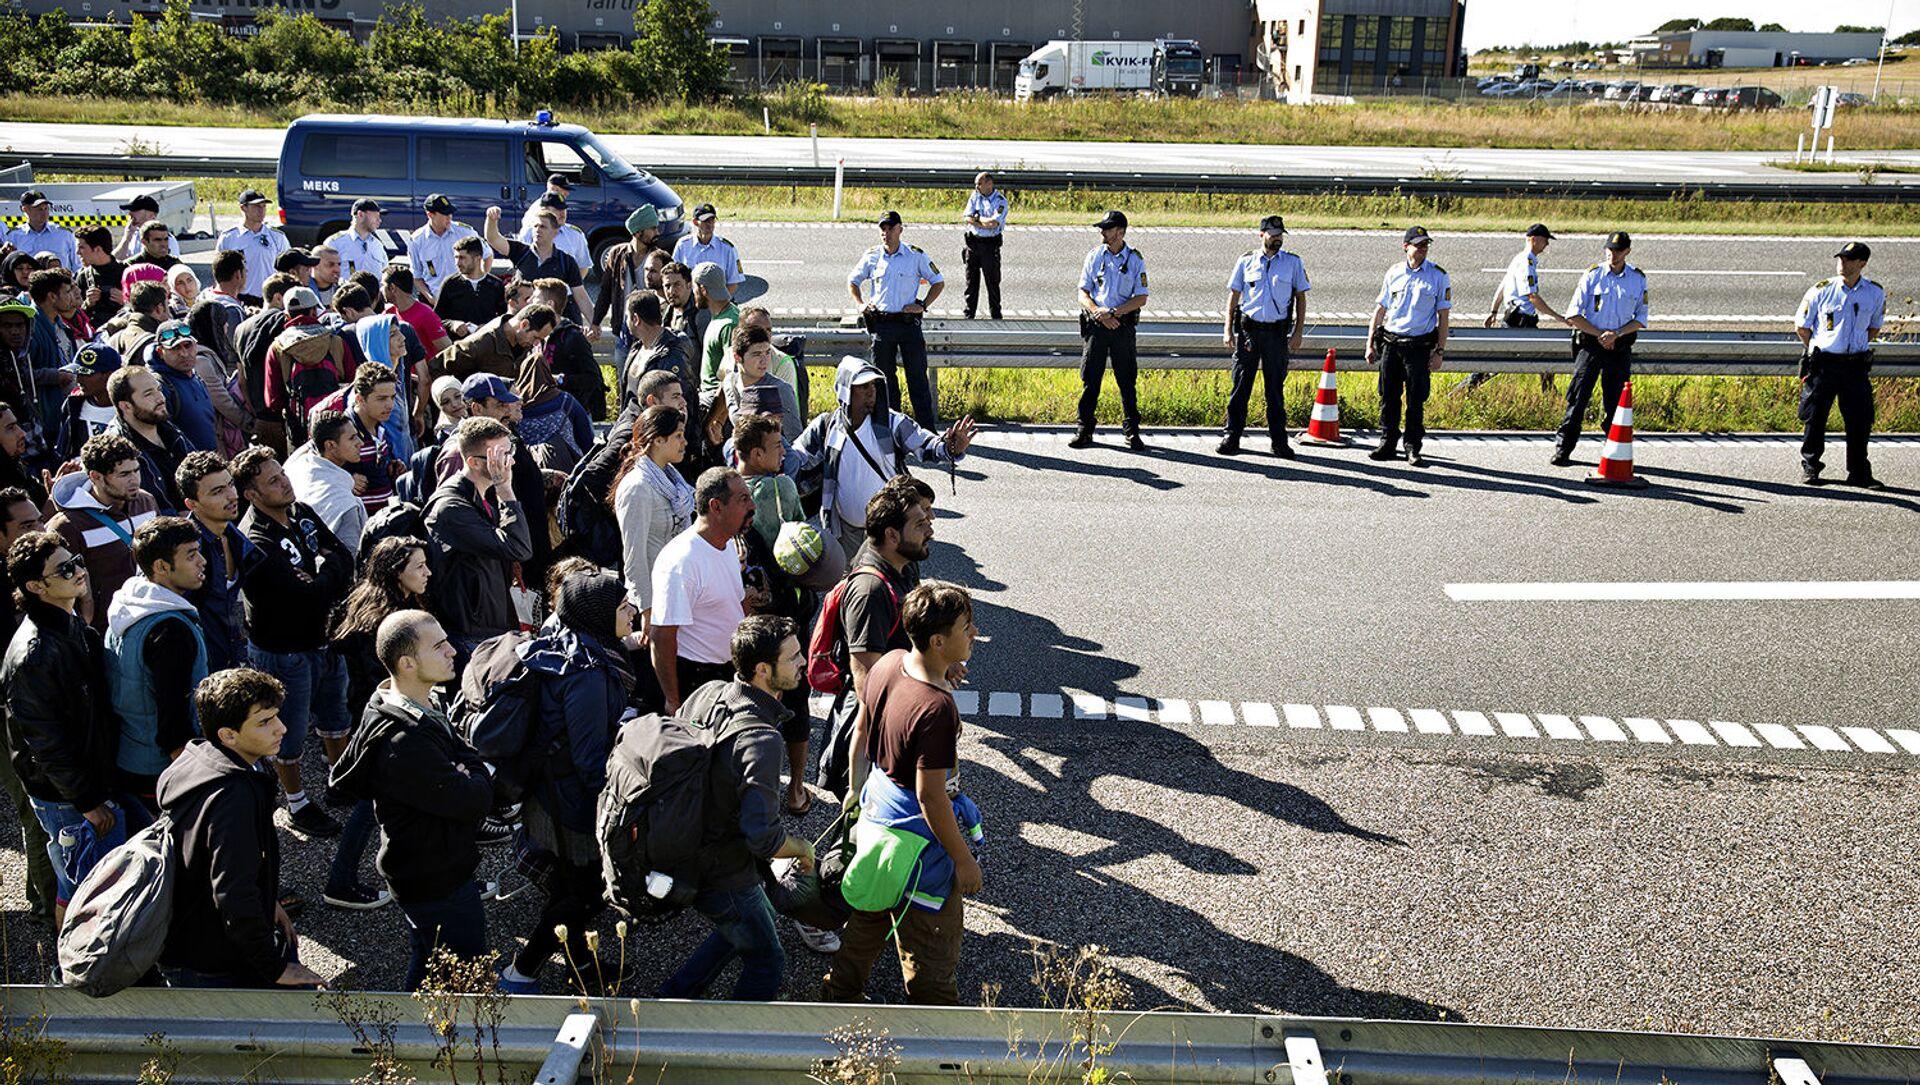 FILE - In this Sept. 9, 2015 file picture hundreds of refugees walk in Southern Jutland motorway near Padborg in Denmark - Sputnik International, 1920, 29.07.2021